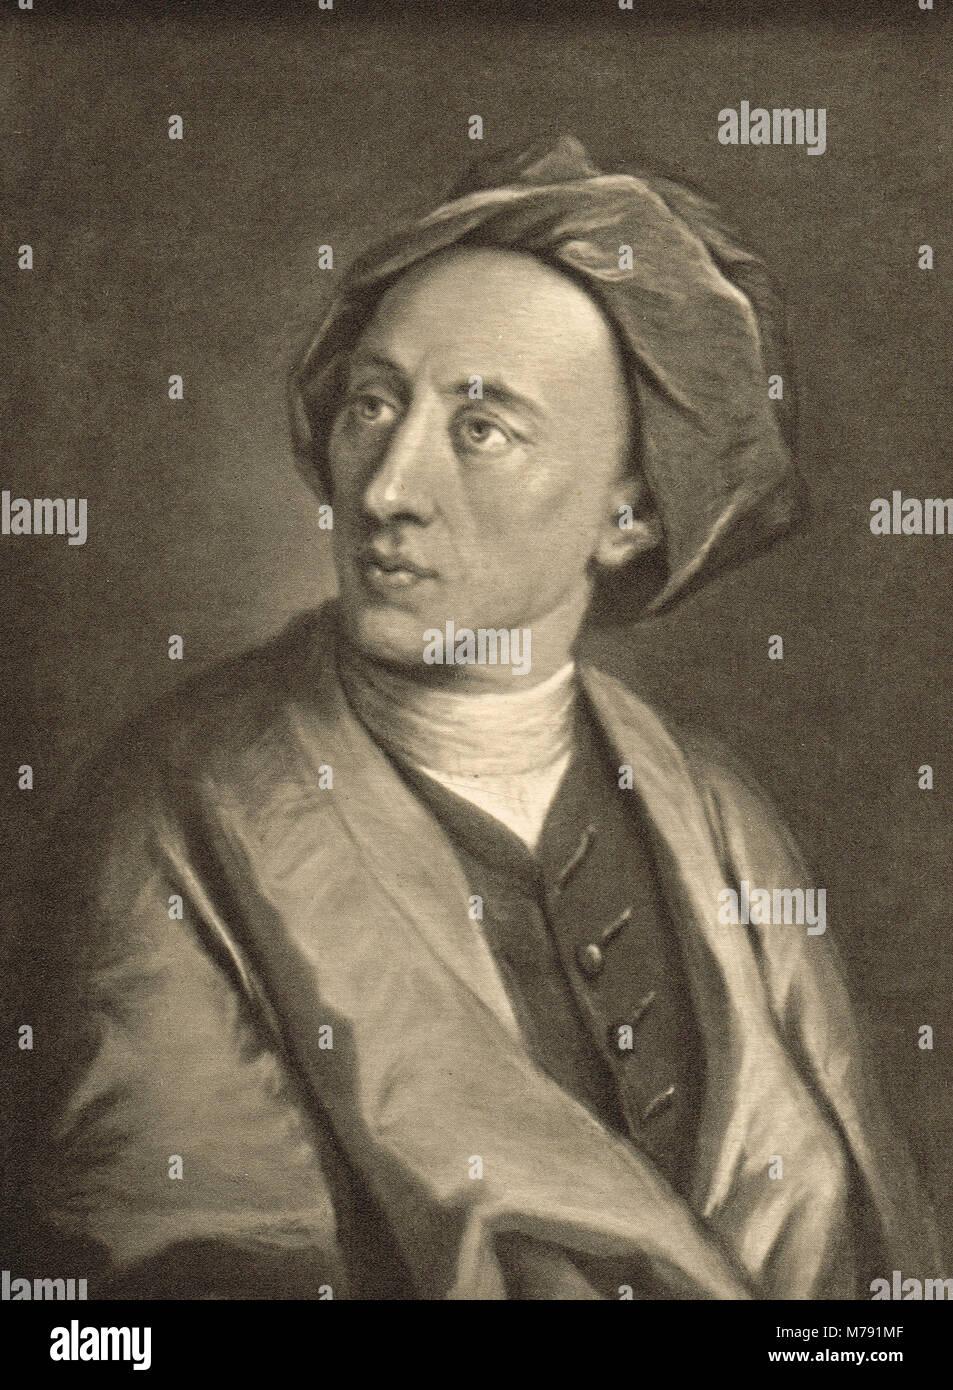 Alexander Pope (1688-1740), English poet - Stock Image